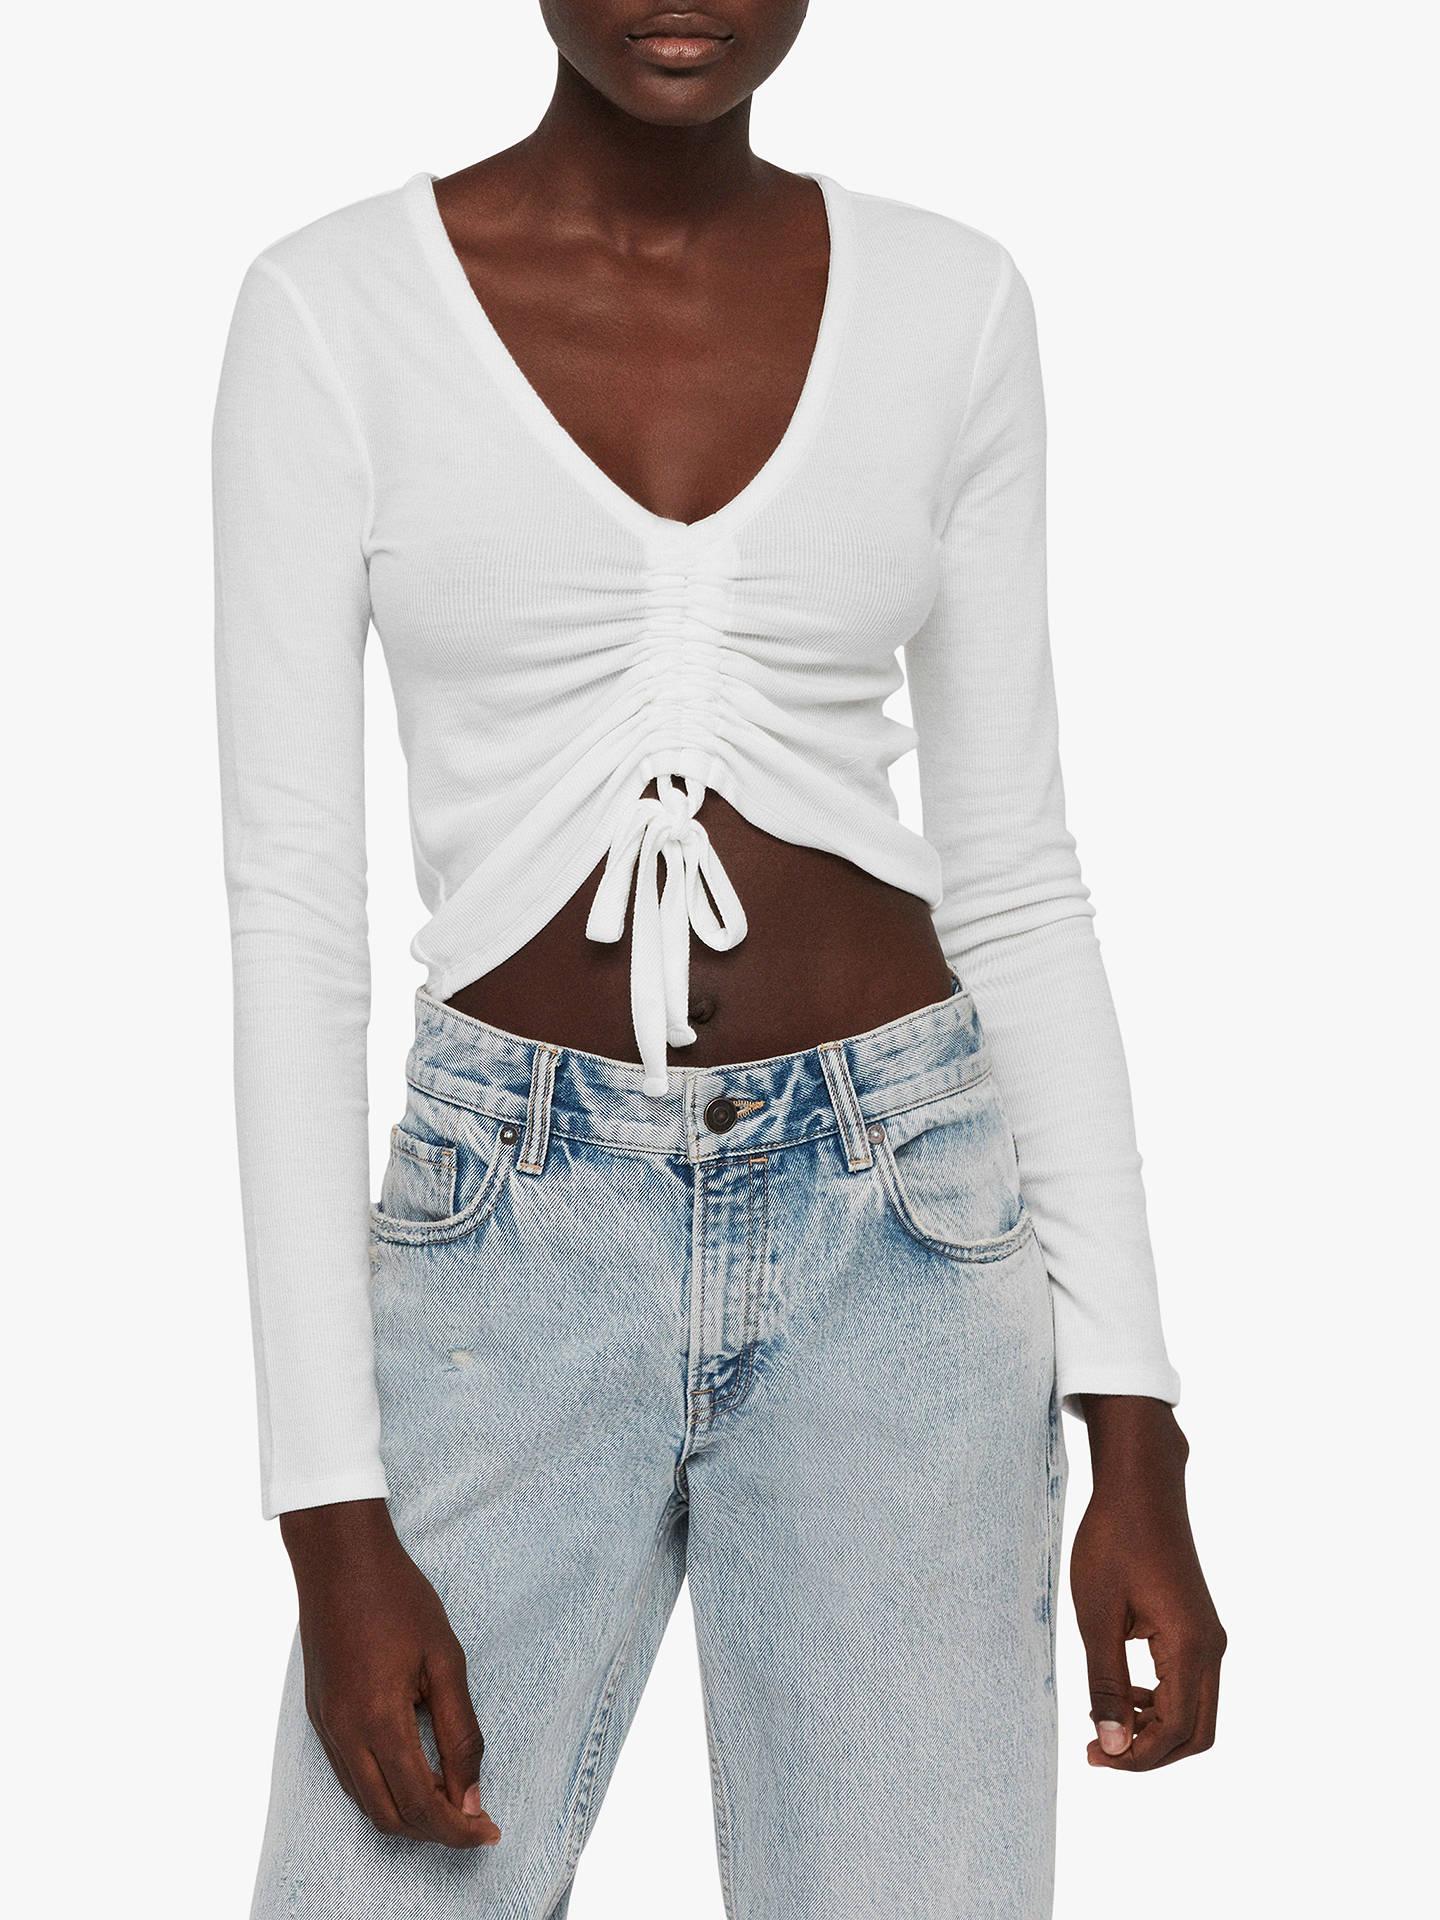 69ceed1a933 ... Buy AllSaints Rina Long Sleeve T-Shirt